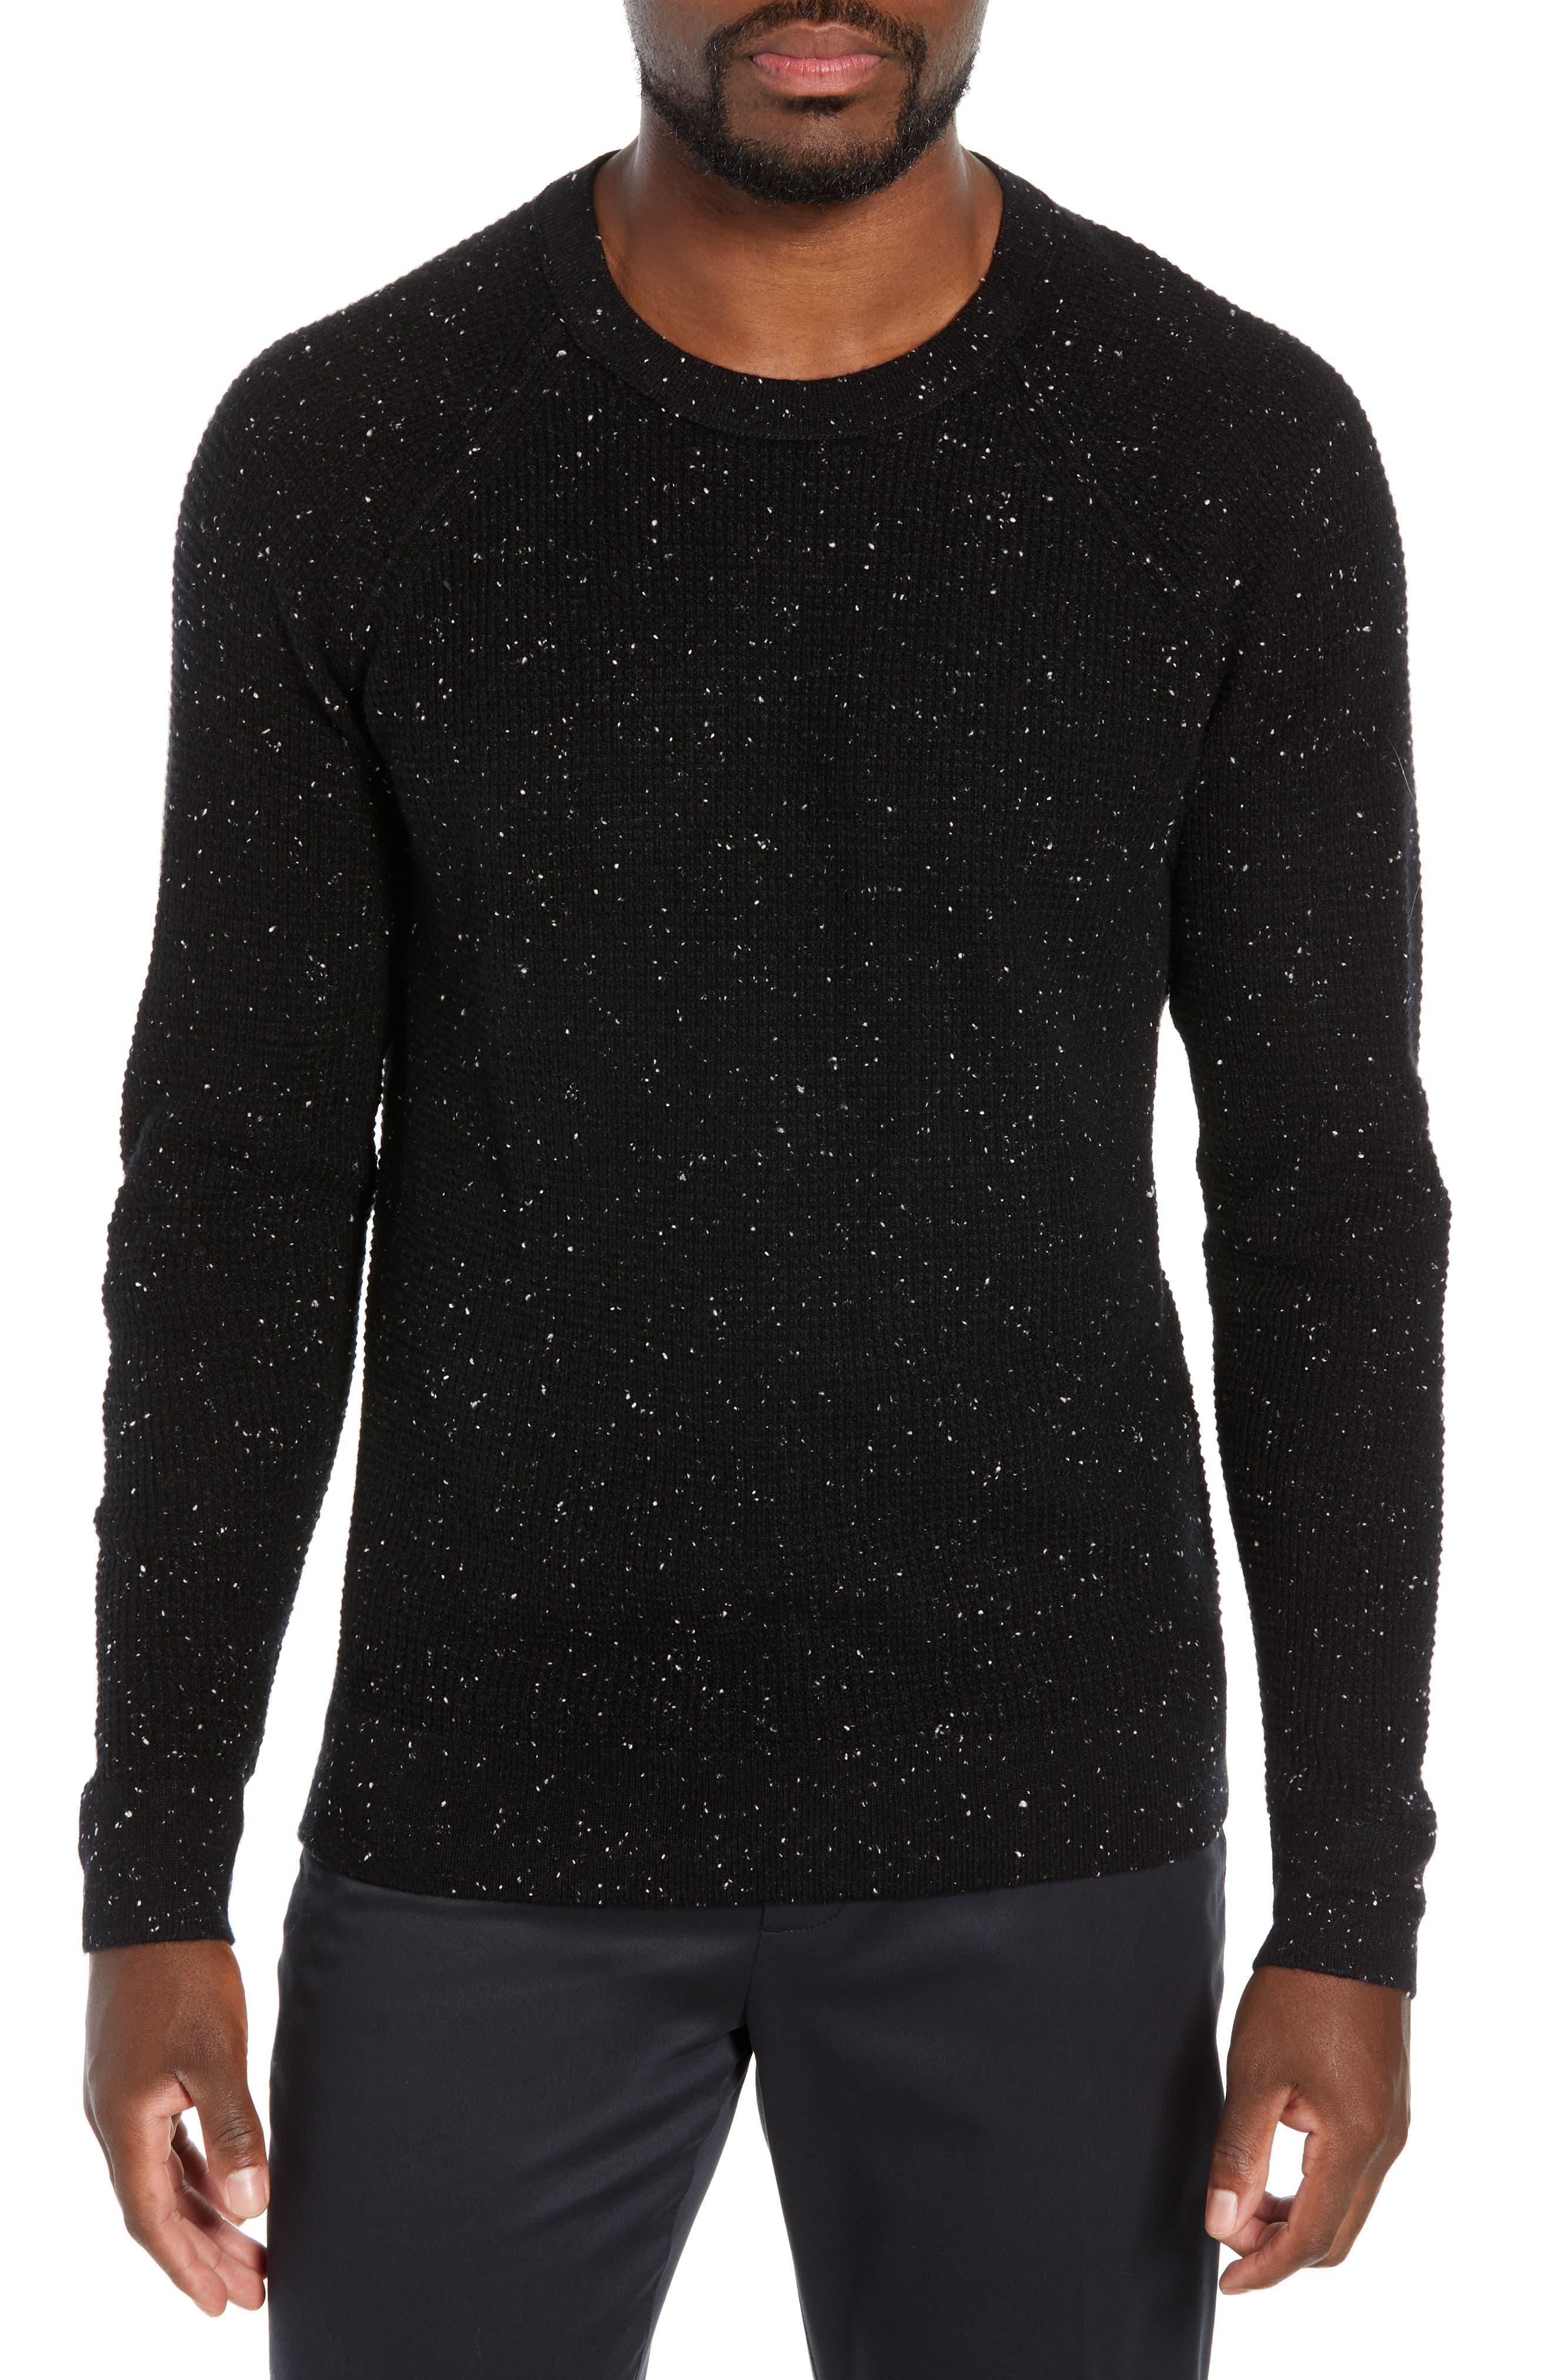 BONOBOS Slim Fit Cashmere Sweater, Main, color, 001